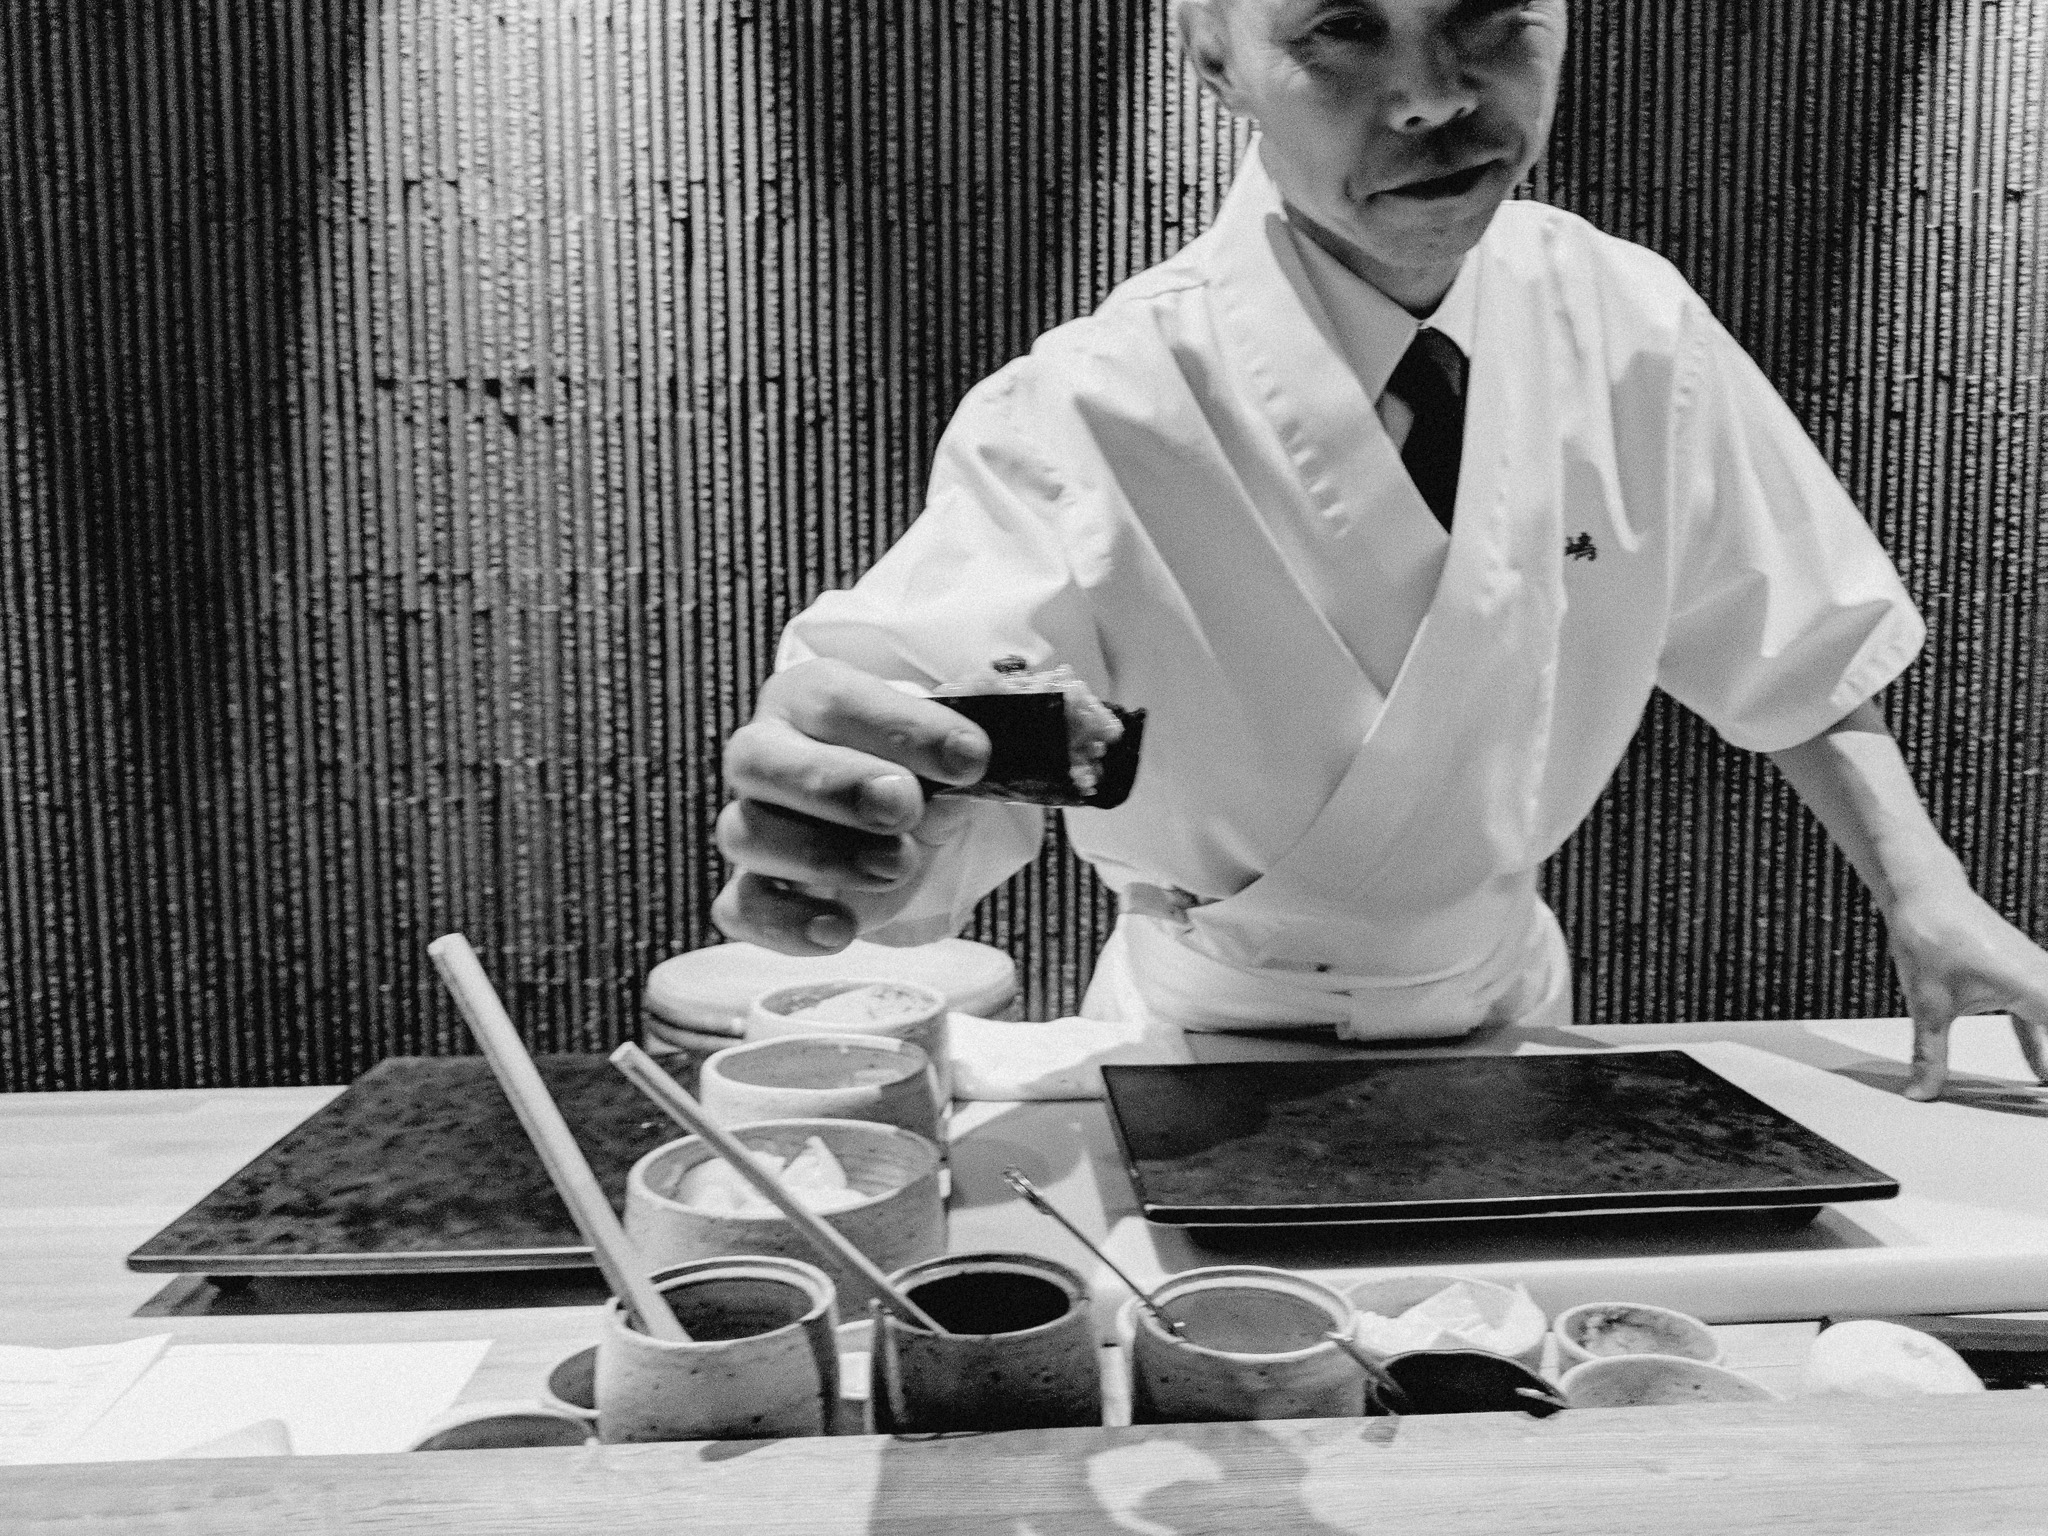 minamishima-melbourne-food-photographer-010.JPG